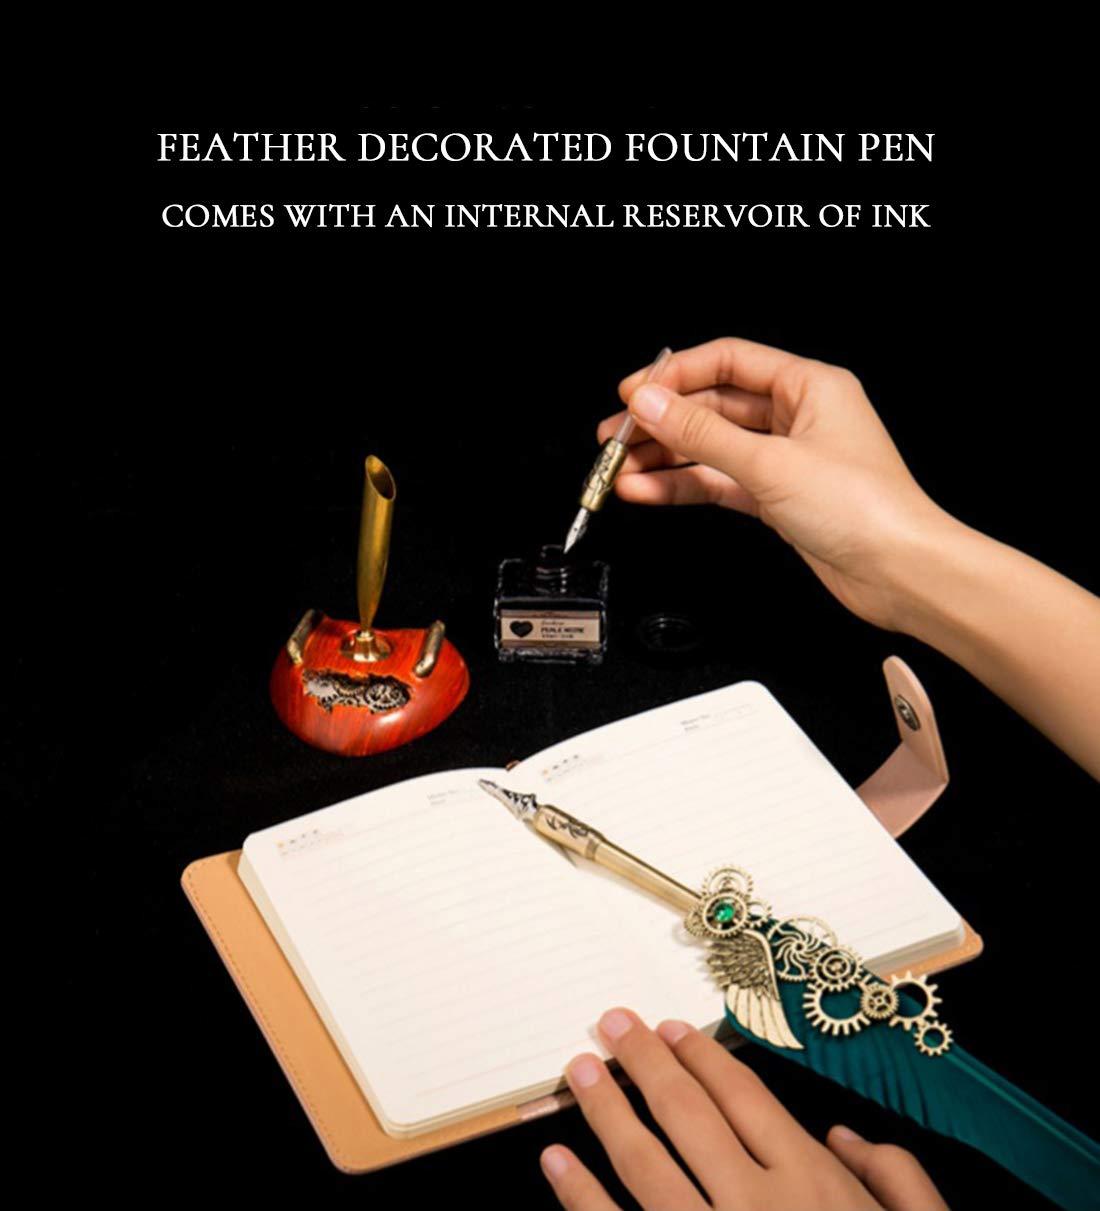 HENHEN Feather Quill Pen Set - 100% Hand Craft - Steampunk Quill Pen and Notebook Set, in Gift Box by HENHEN (Image #3)